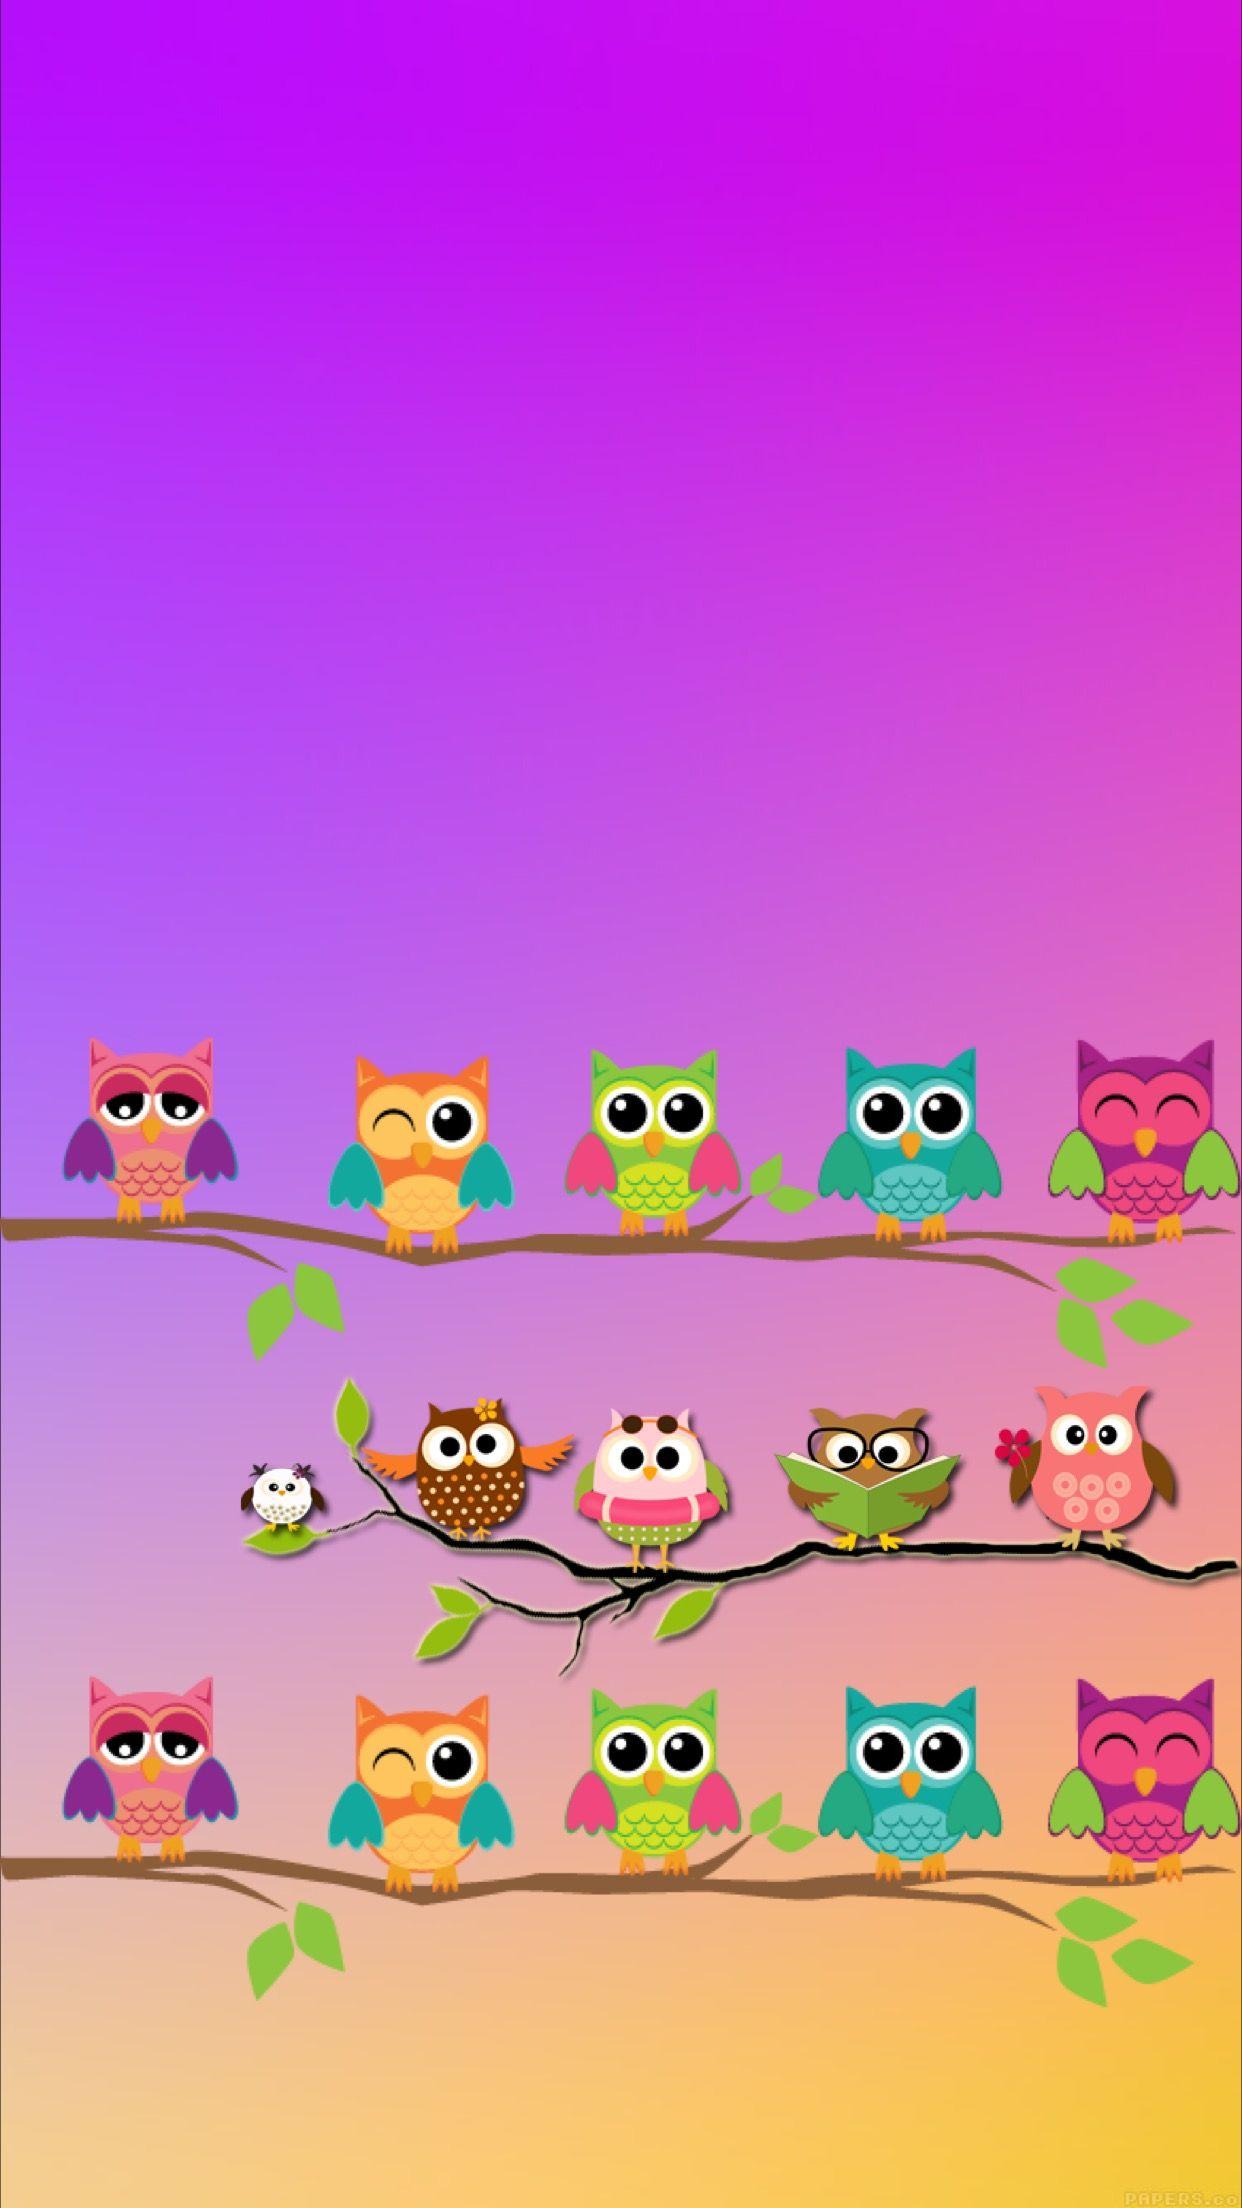 Gambar Wallpaper Kartun Owl Kumpulan Wallpaper